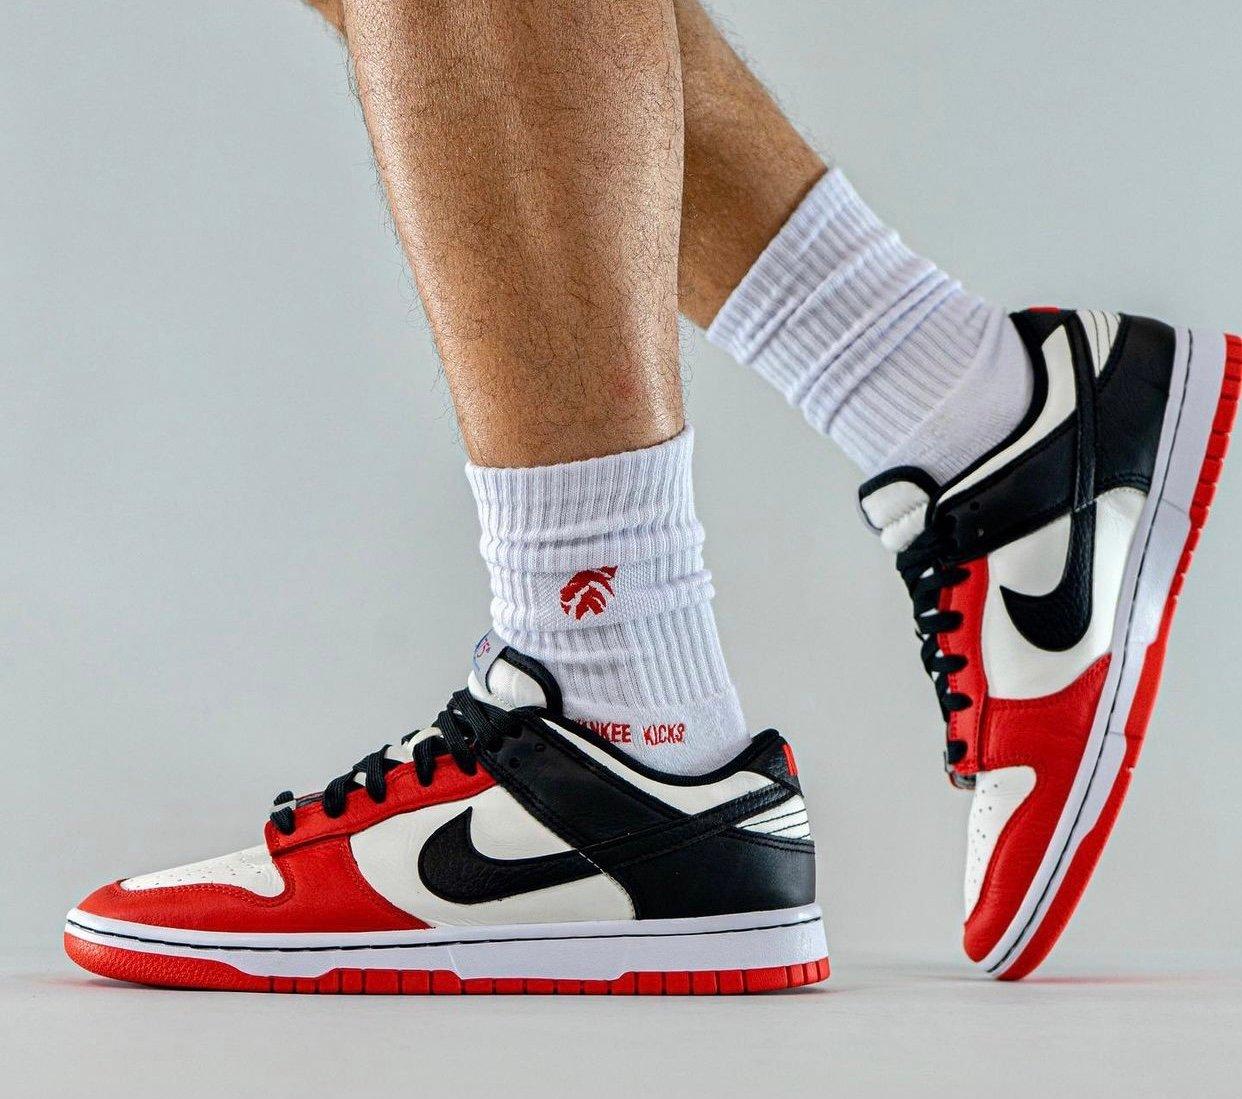 NBA Nike Dunk Low Chicago 75th Anniversary DD3363-100 On-Feet